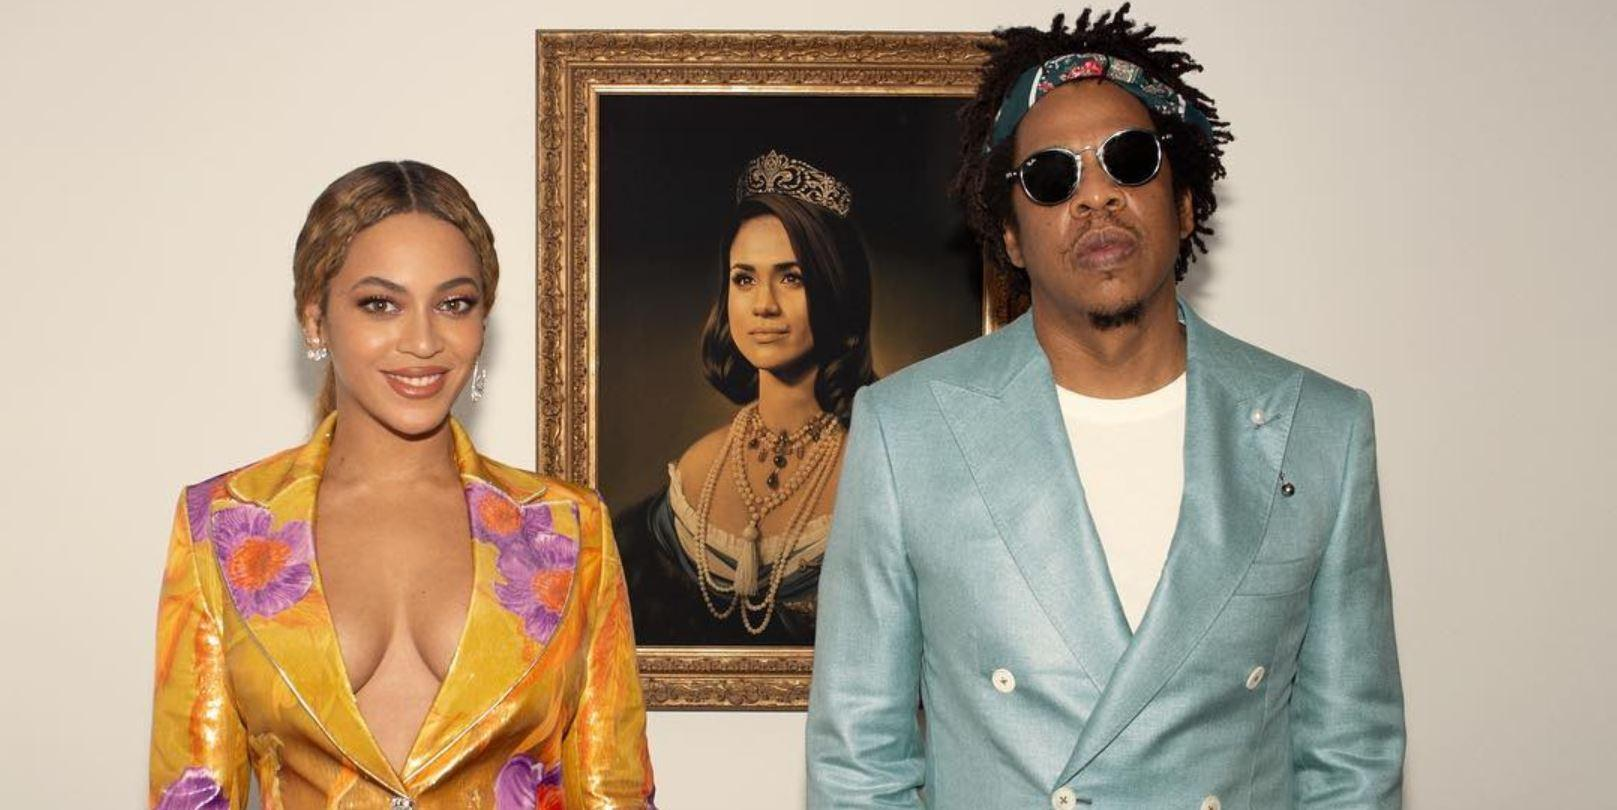 Beyoncé veste roupa da marca portuguesa Marques'Almeida